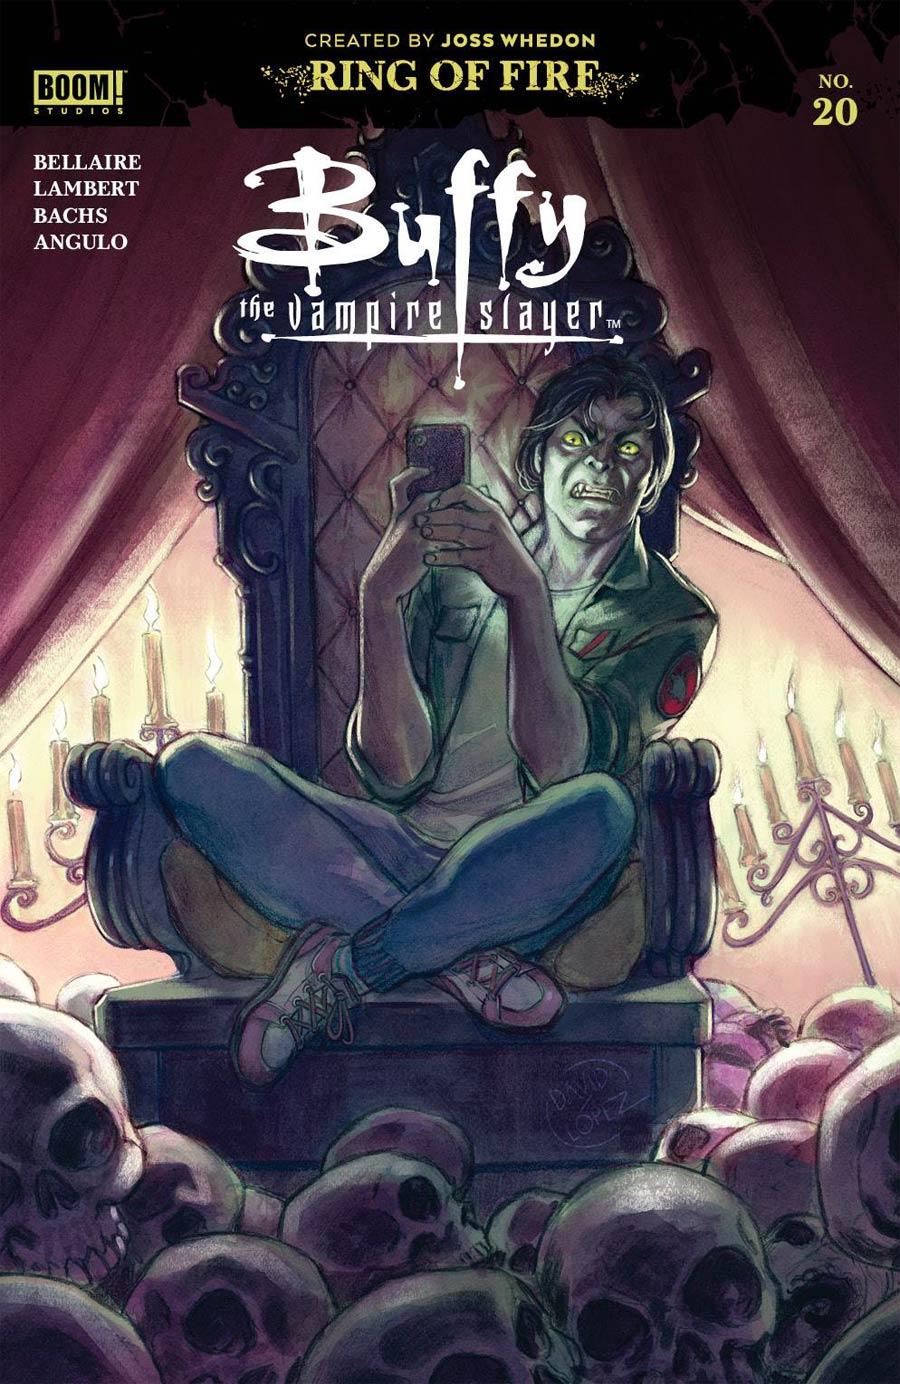 Buffy The Vampire Slayer Vol 2 #20 Cover A Regular David Lopez Cover